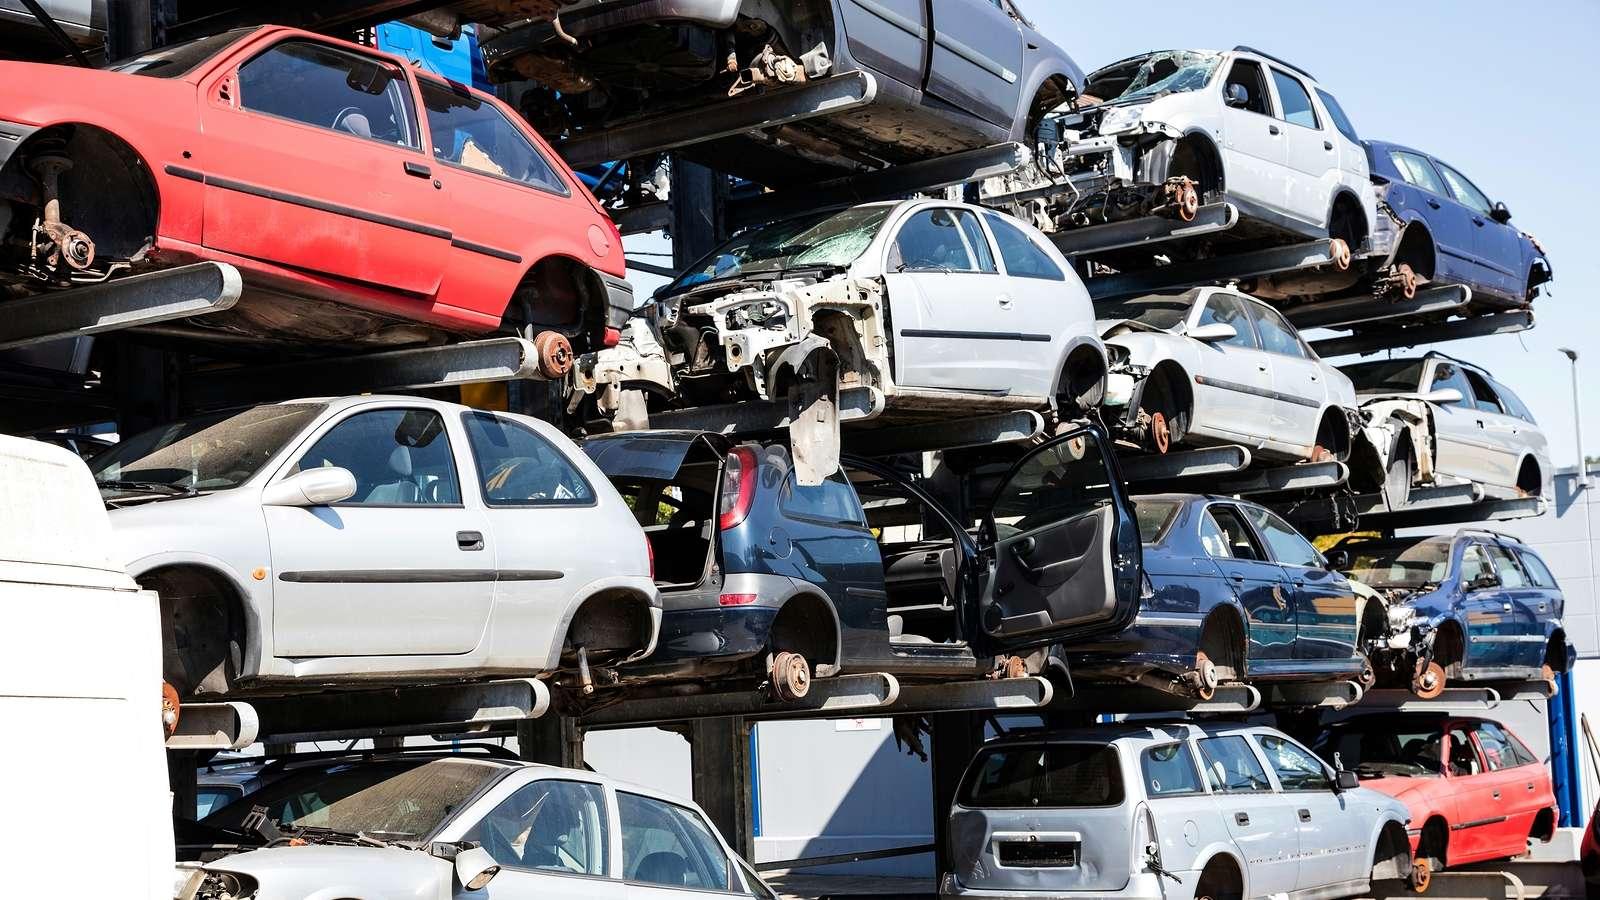 Scrap Metal Buyers, Recycling Center   Reno, TX